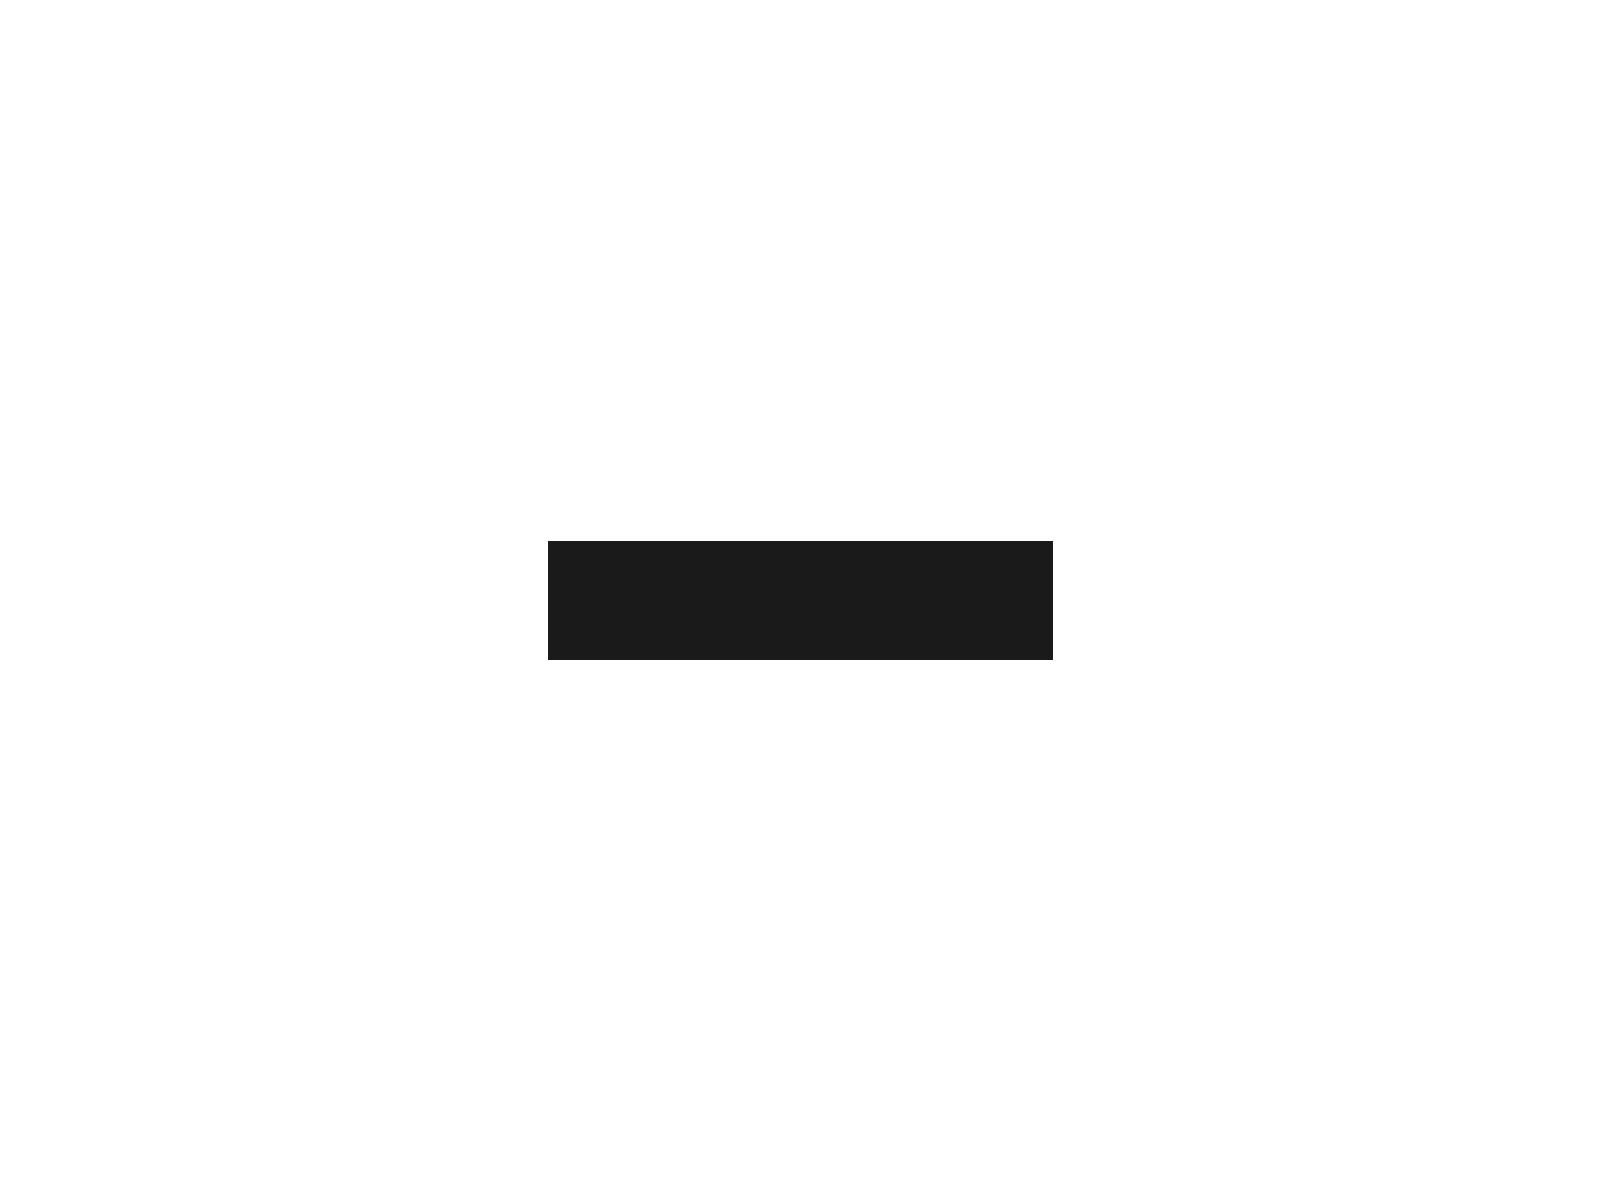 200325_logo_0018_Blunt